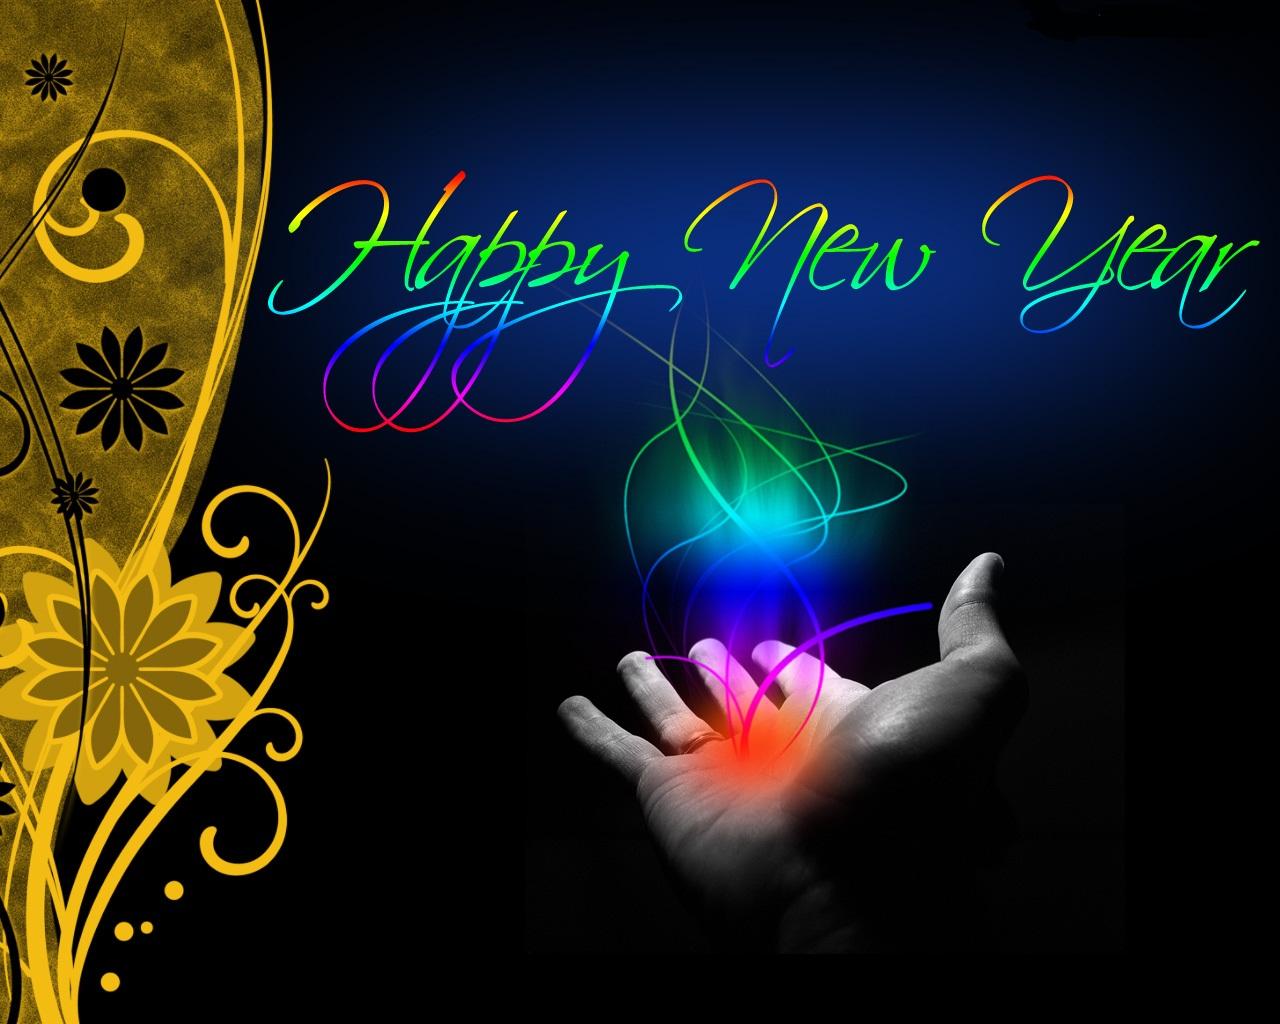 Happy-New-Year-HD-Wallpapers-free-download-4k-amazing-artwork-smart-phones-pictures-mac-desktop-images-samsung-phone-wallpapers-widescreen-1280x1024